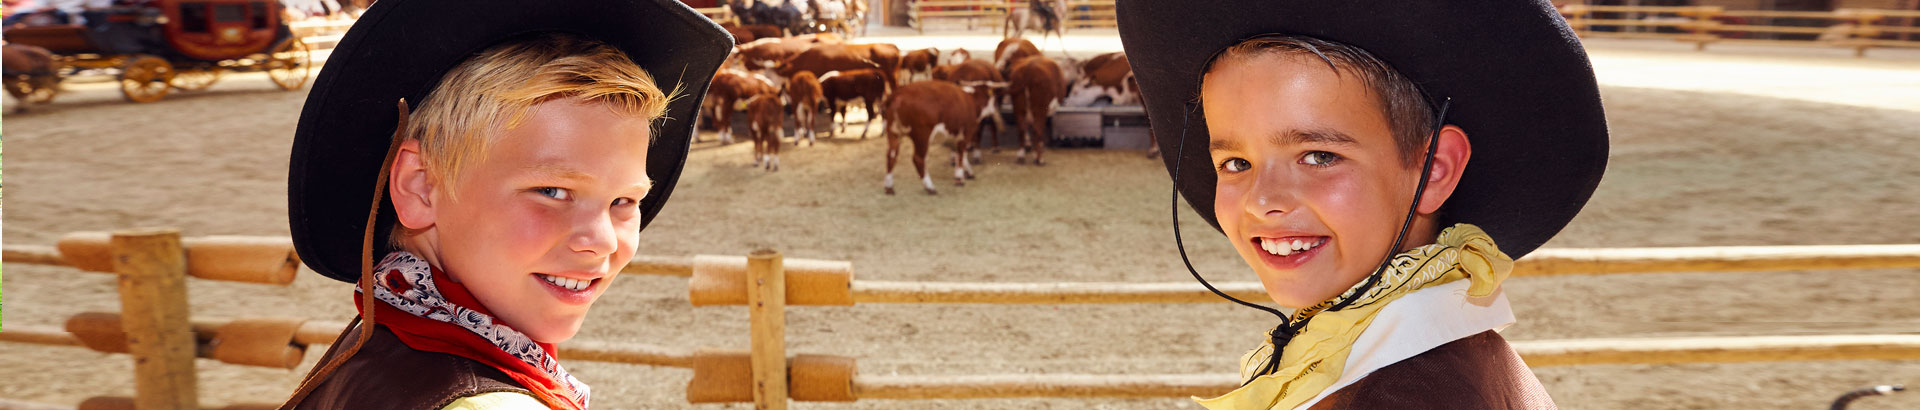 Cowboyshow